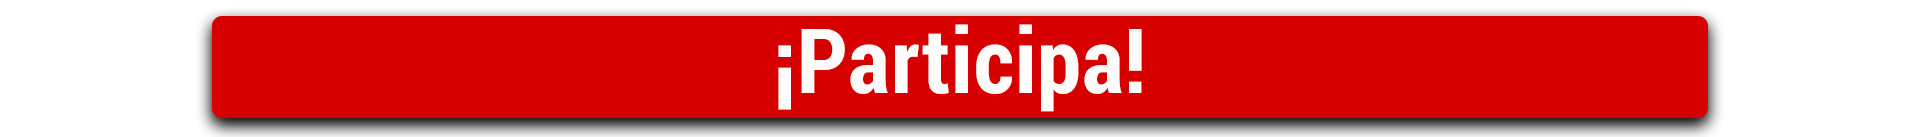 participa-rototom